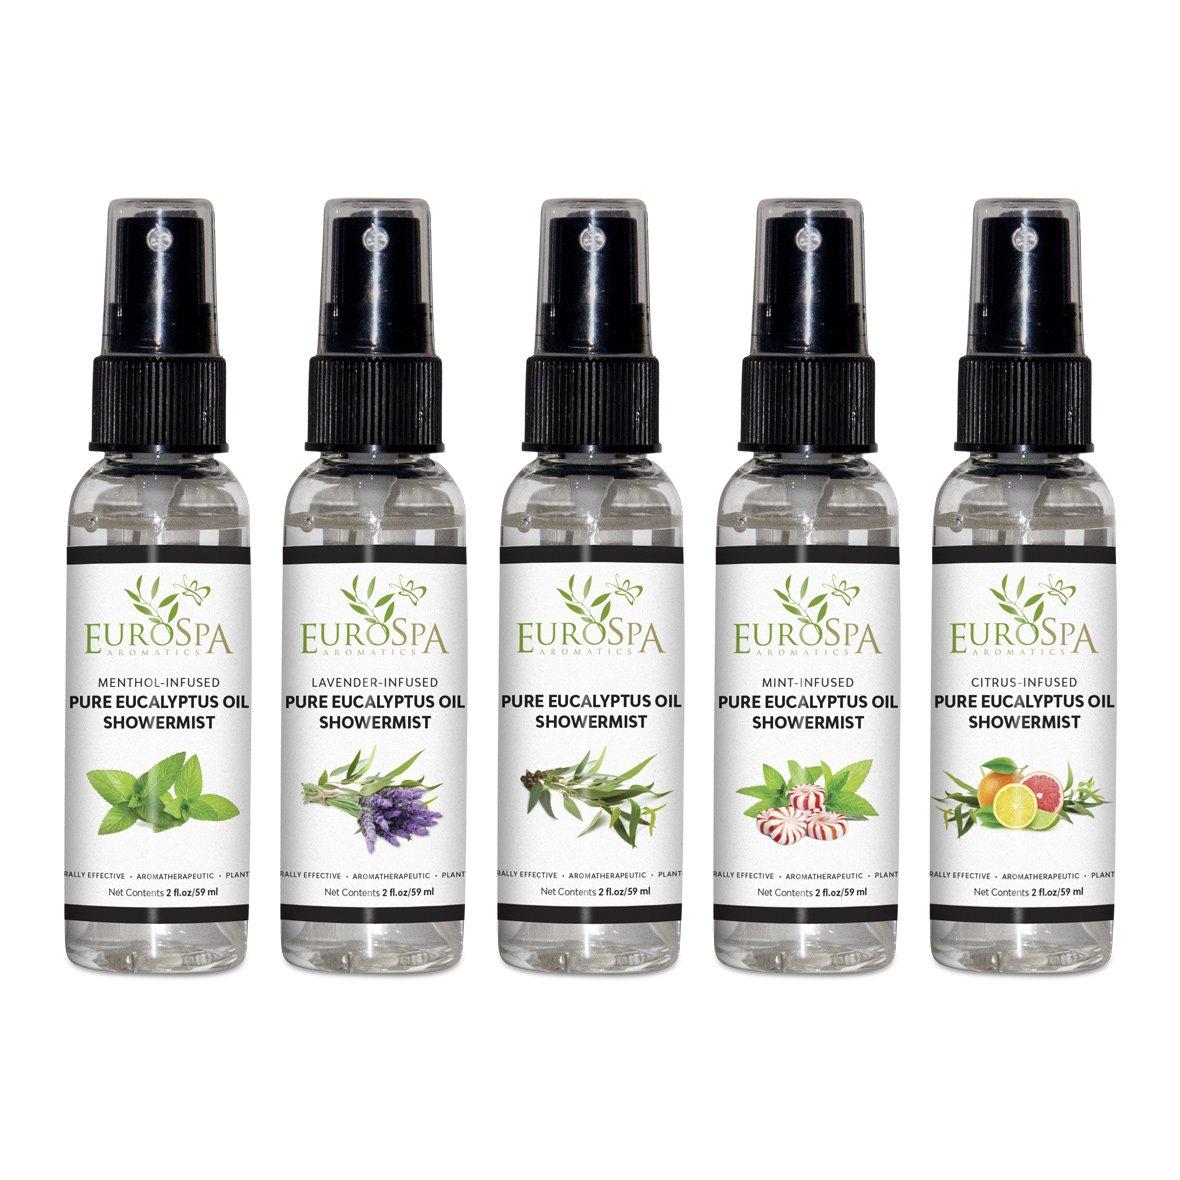 EuroSpa Aromatics Pure Eucalyptus Oil ShowerMist and Steam Room Spray, All-Natural Premium Aromatherapy Essential Oils - Variety 5 Pack - 2 oz Each by EuroSpa Aromatics